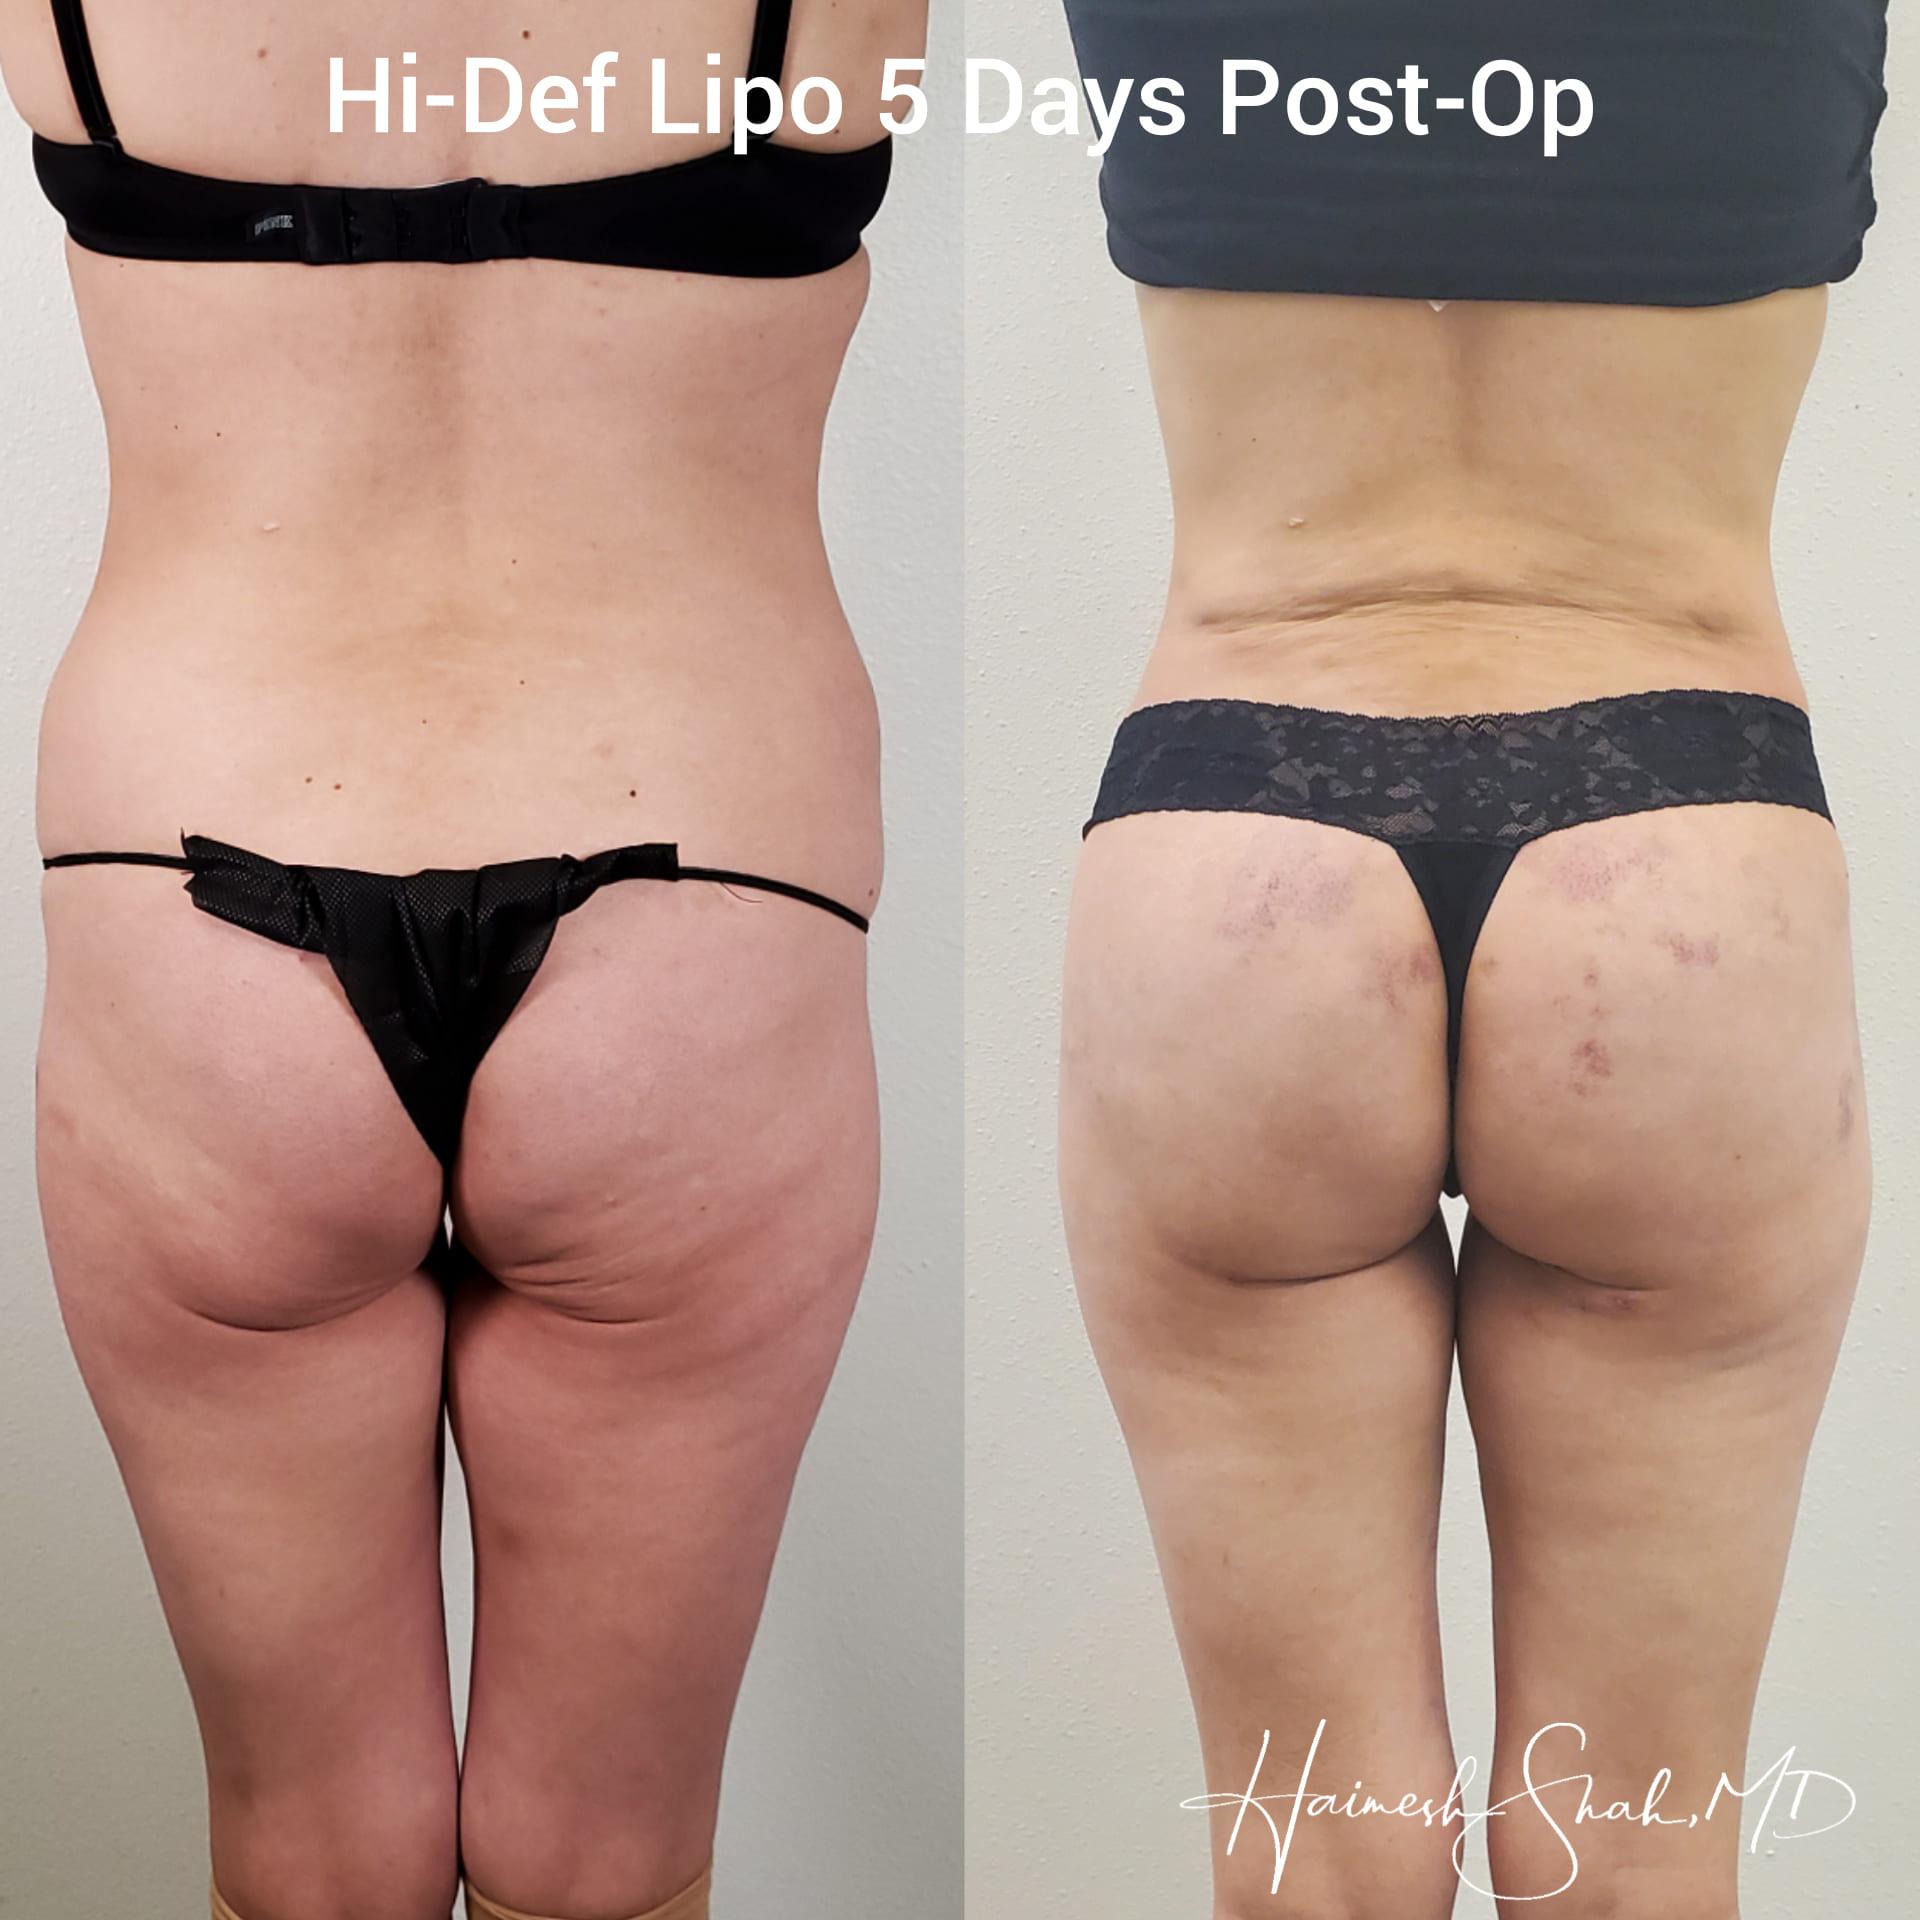 liposuction surgeon